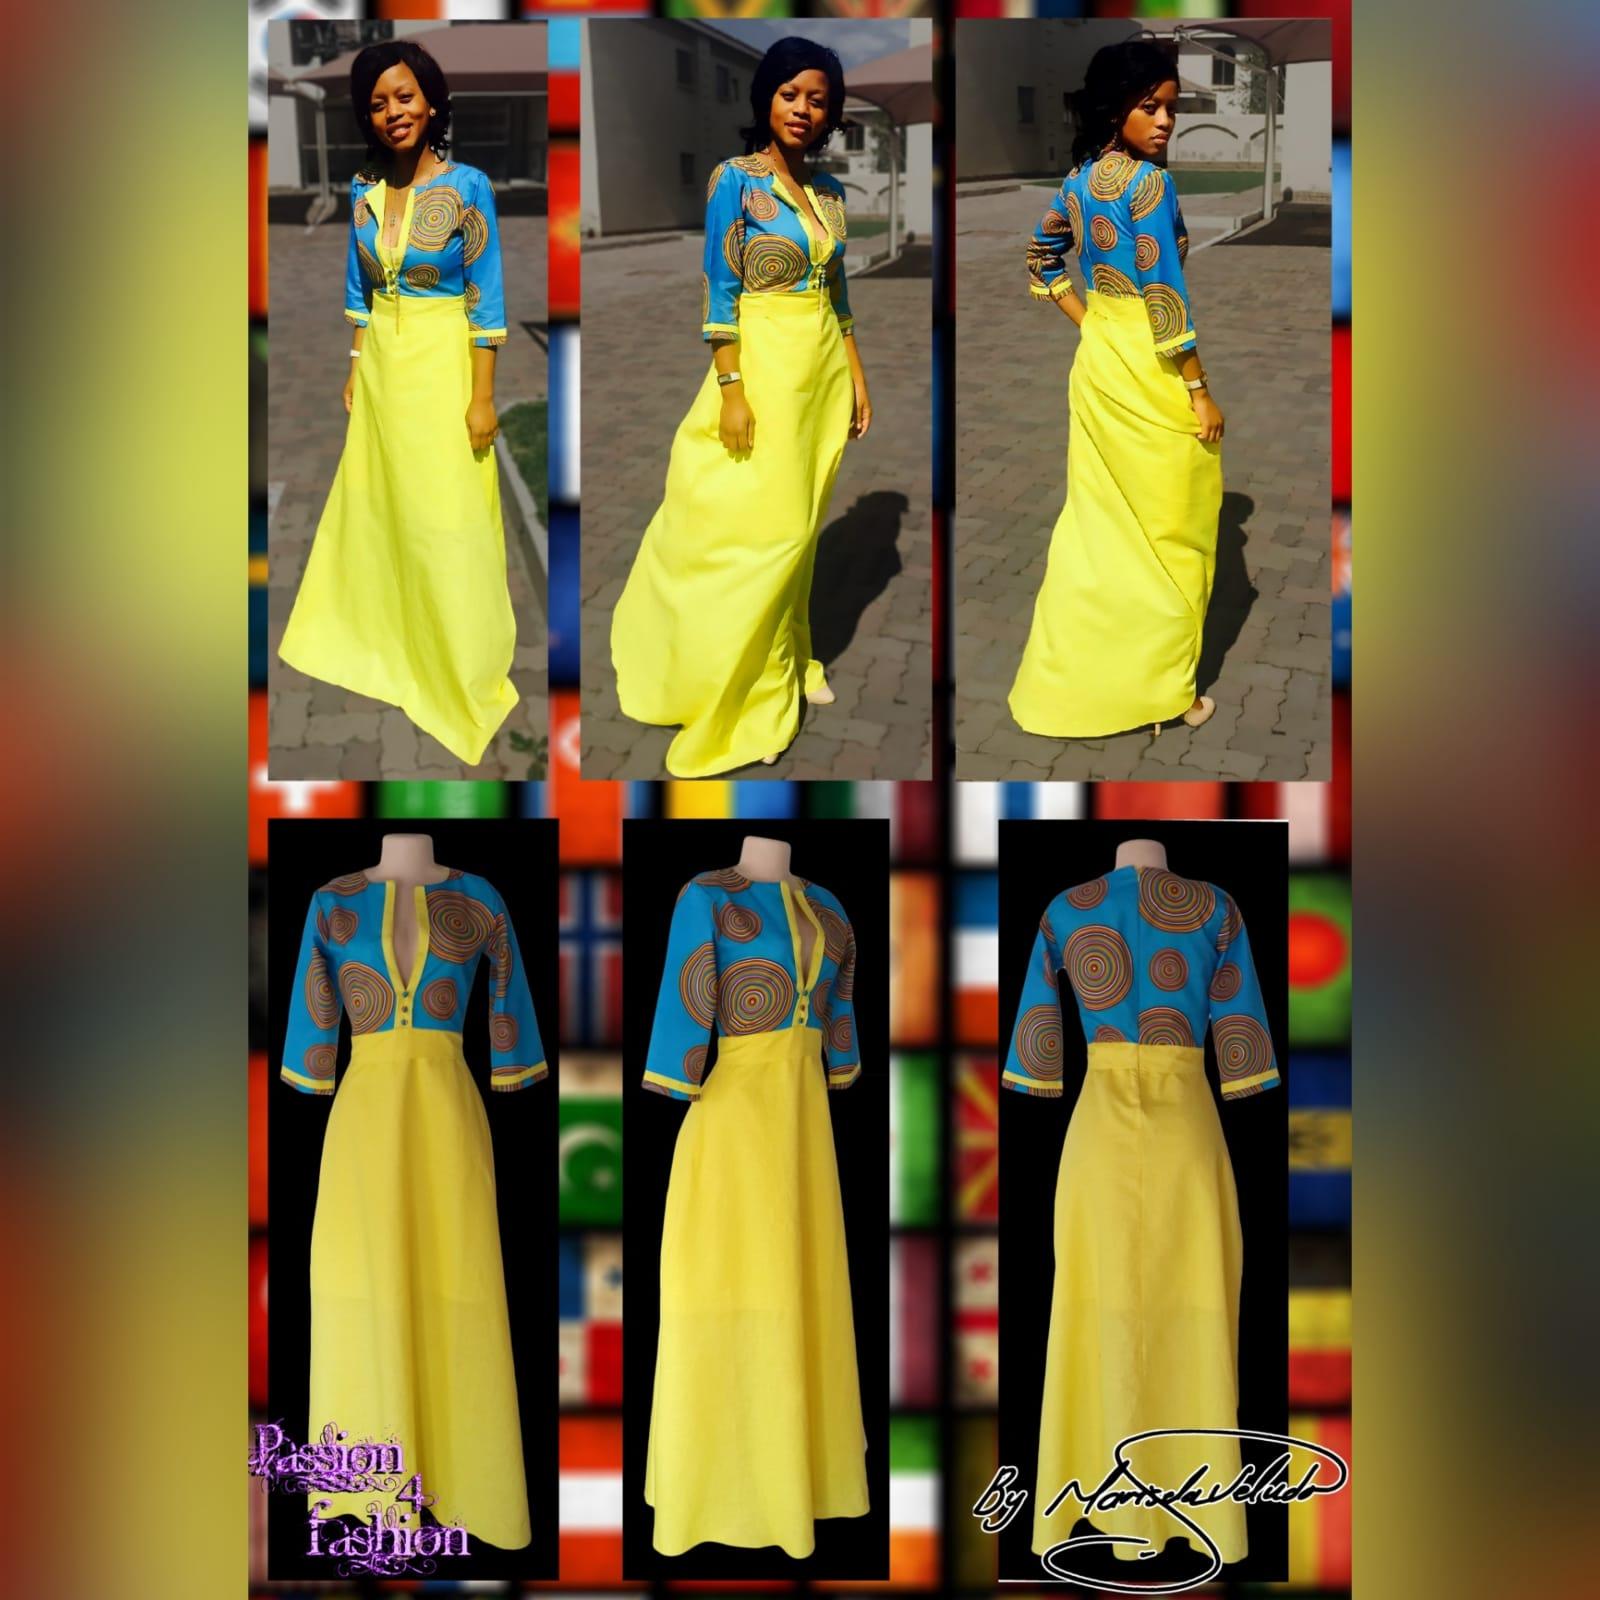 Blue & yellow modern traditional dress 2 modern traditional blue and yellow empire fit dress. Flowy bottom, neckline with a slit.